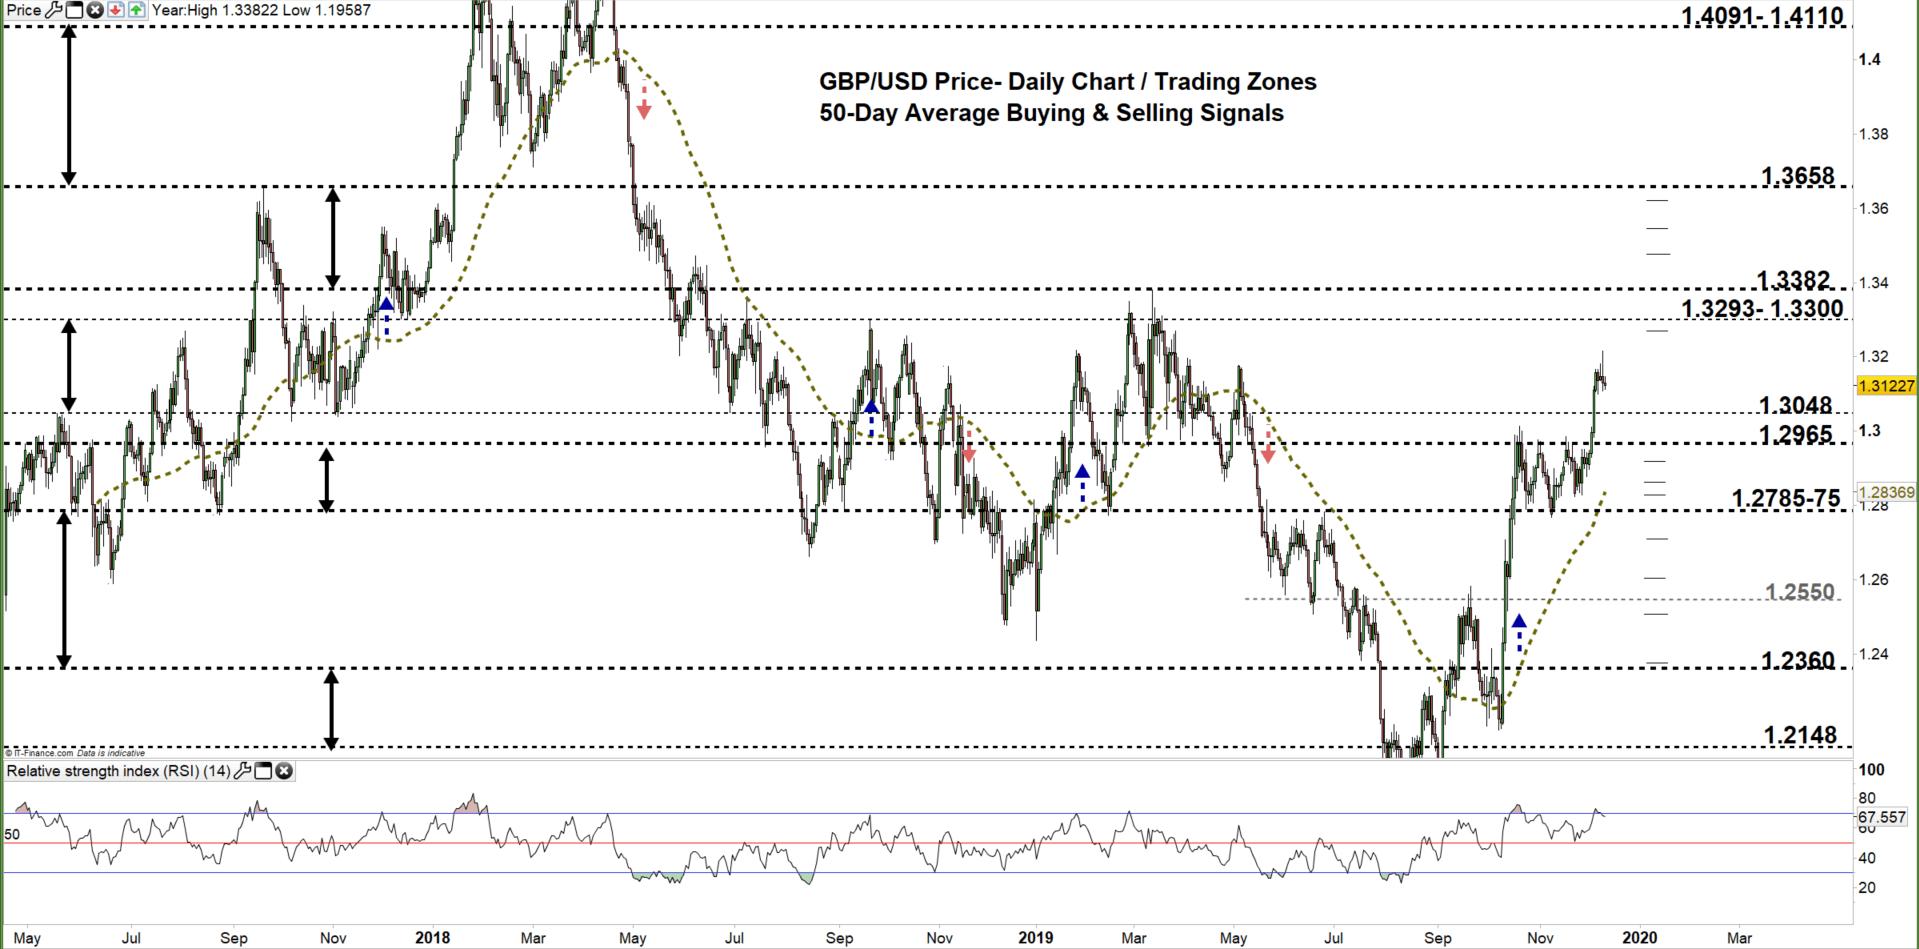 British Pound To Usd Price Forecast